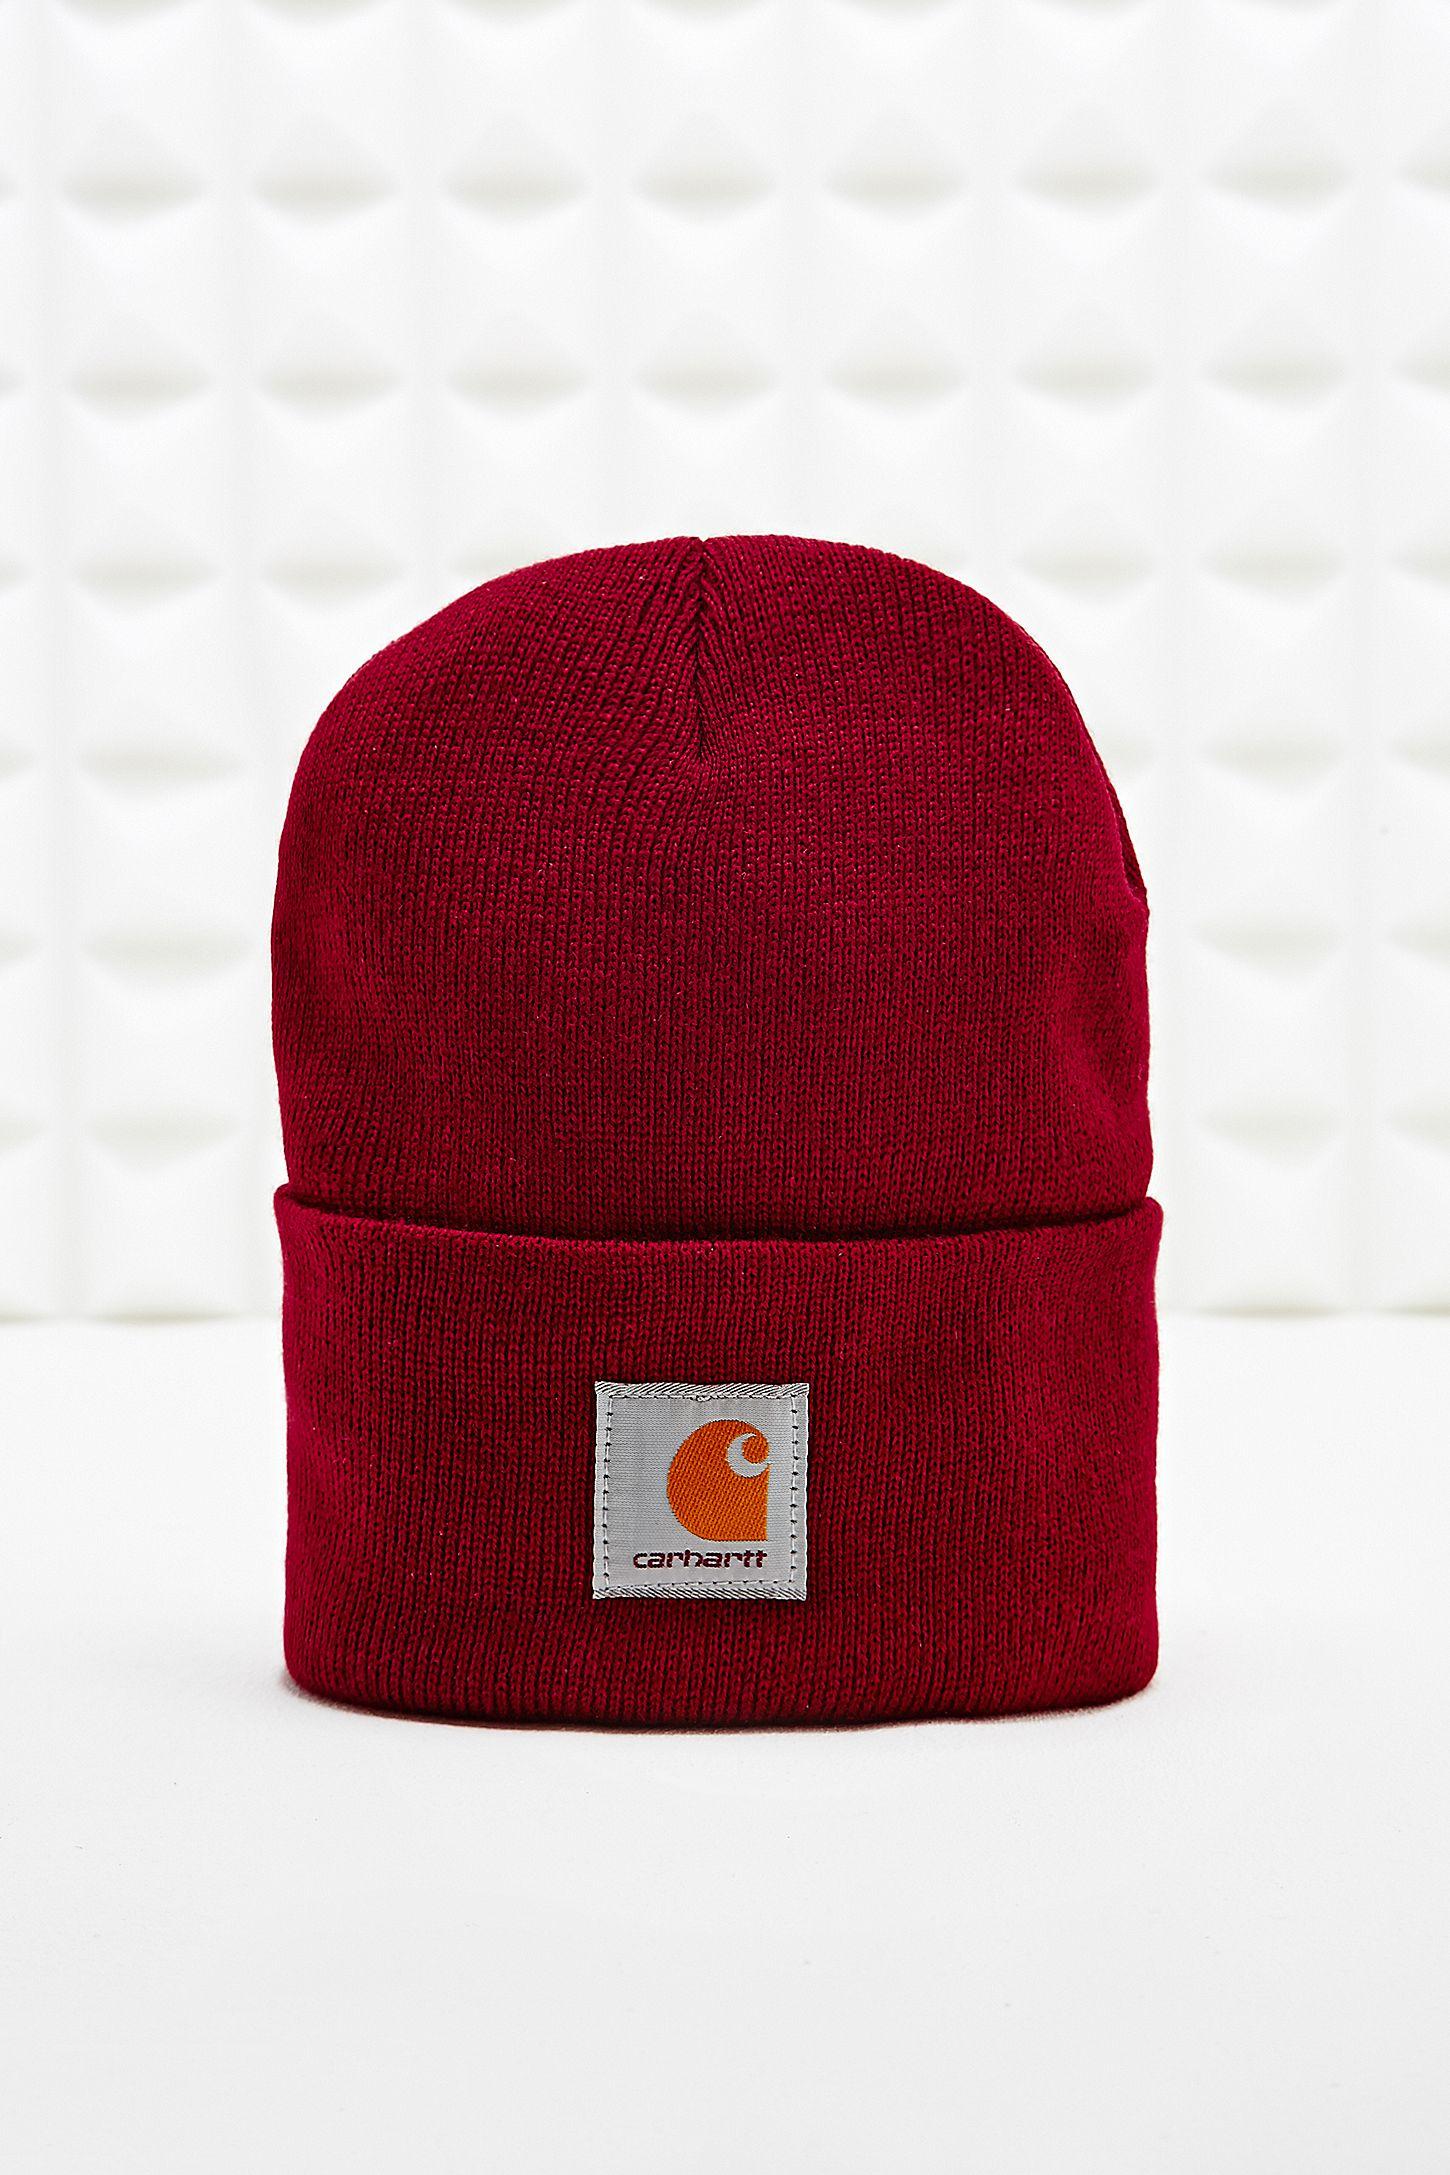 0d73de051cb Carhartt Cordovan Beanie Hat in Burgundy